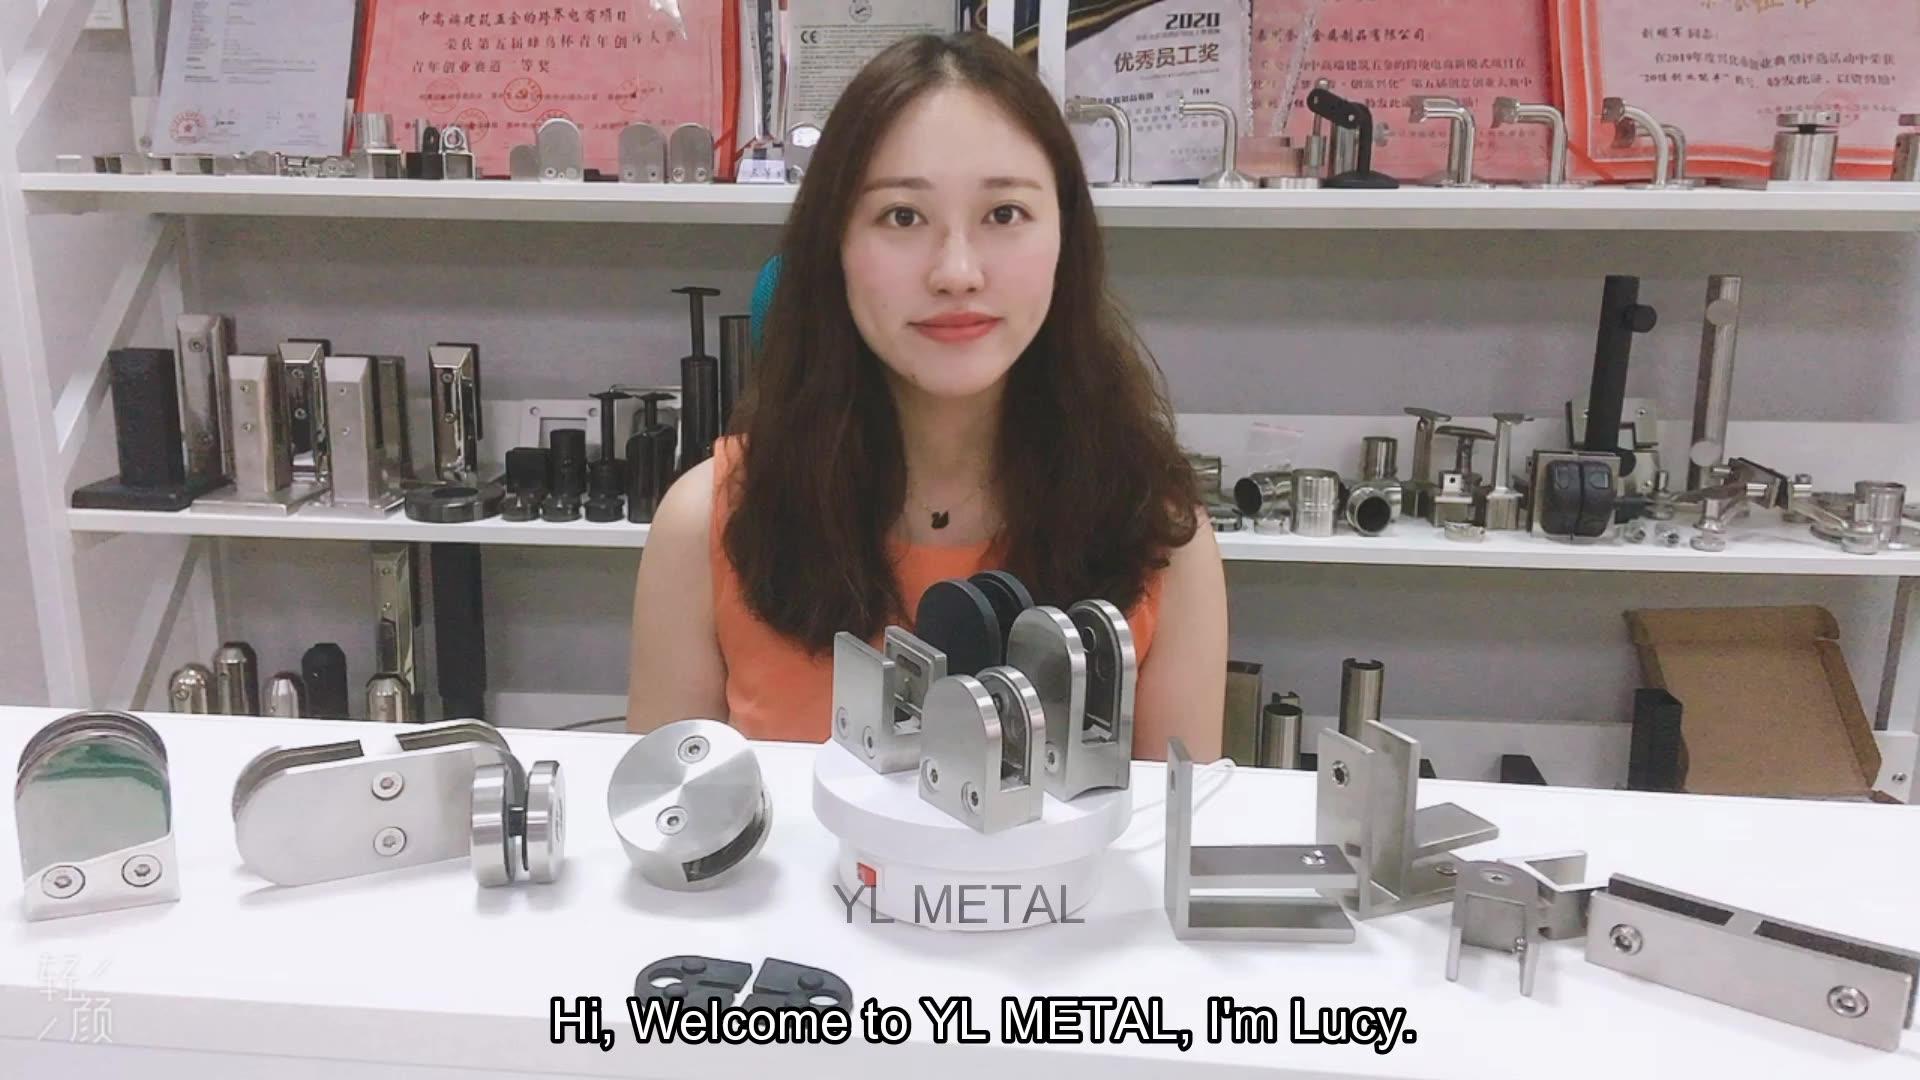 YL Peringkat Teratas Yang Sangat Baik 304 316 Inox Pemasangan Kaca Desain Klem untuk Balkon Kaca Railing Clamp